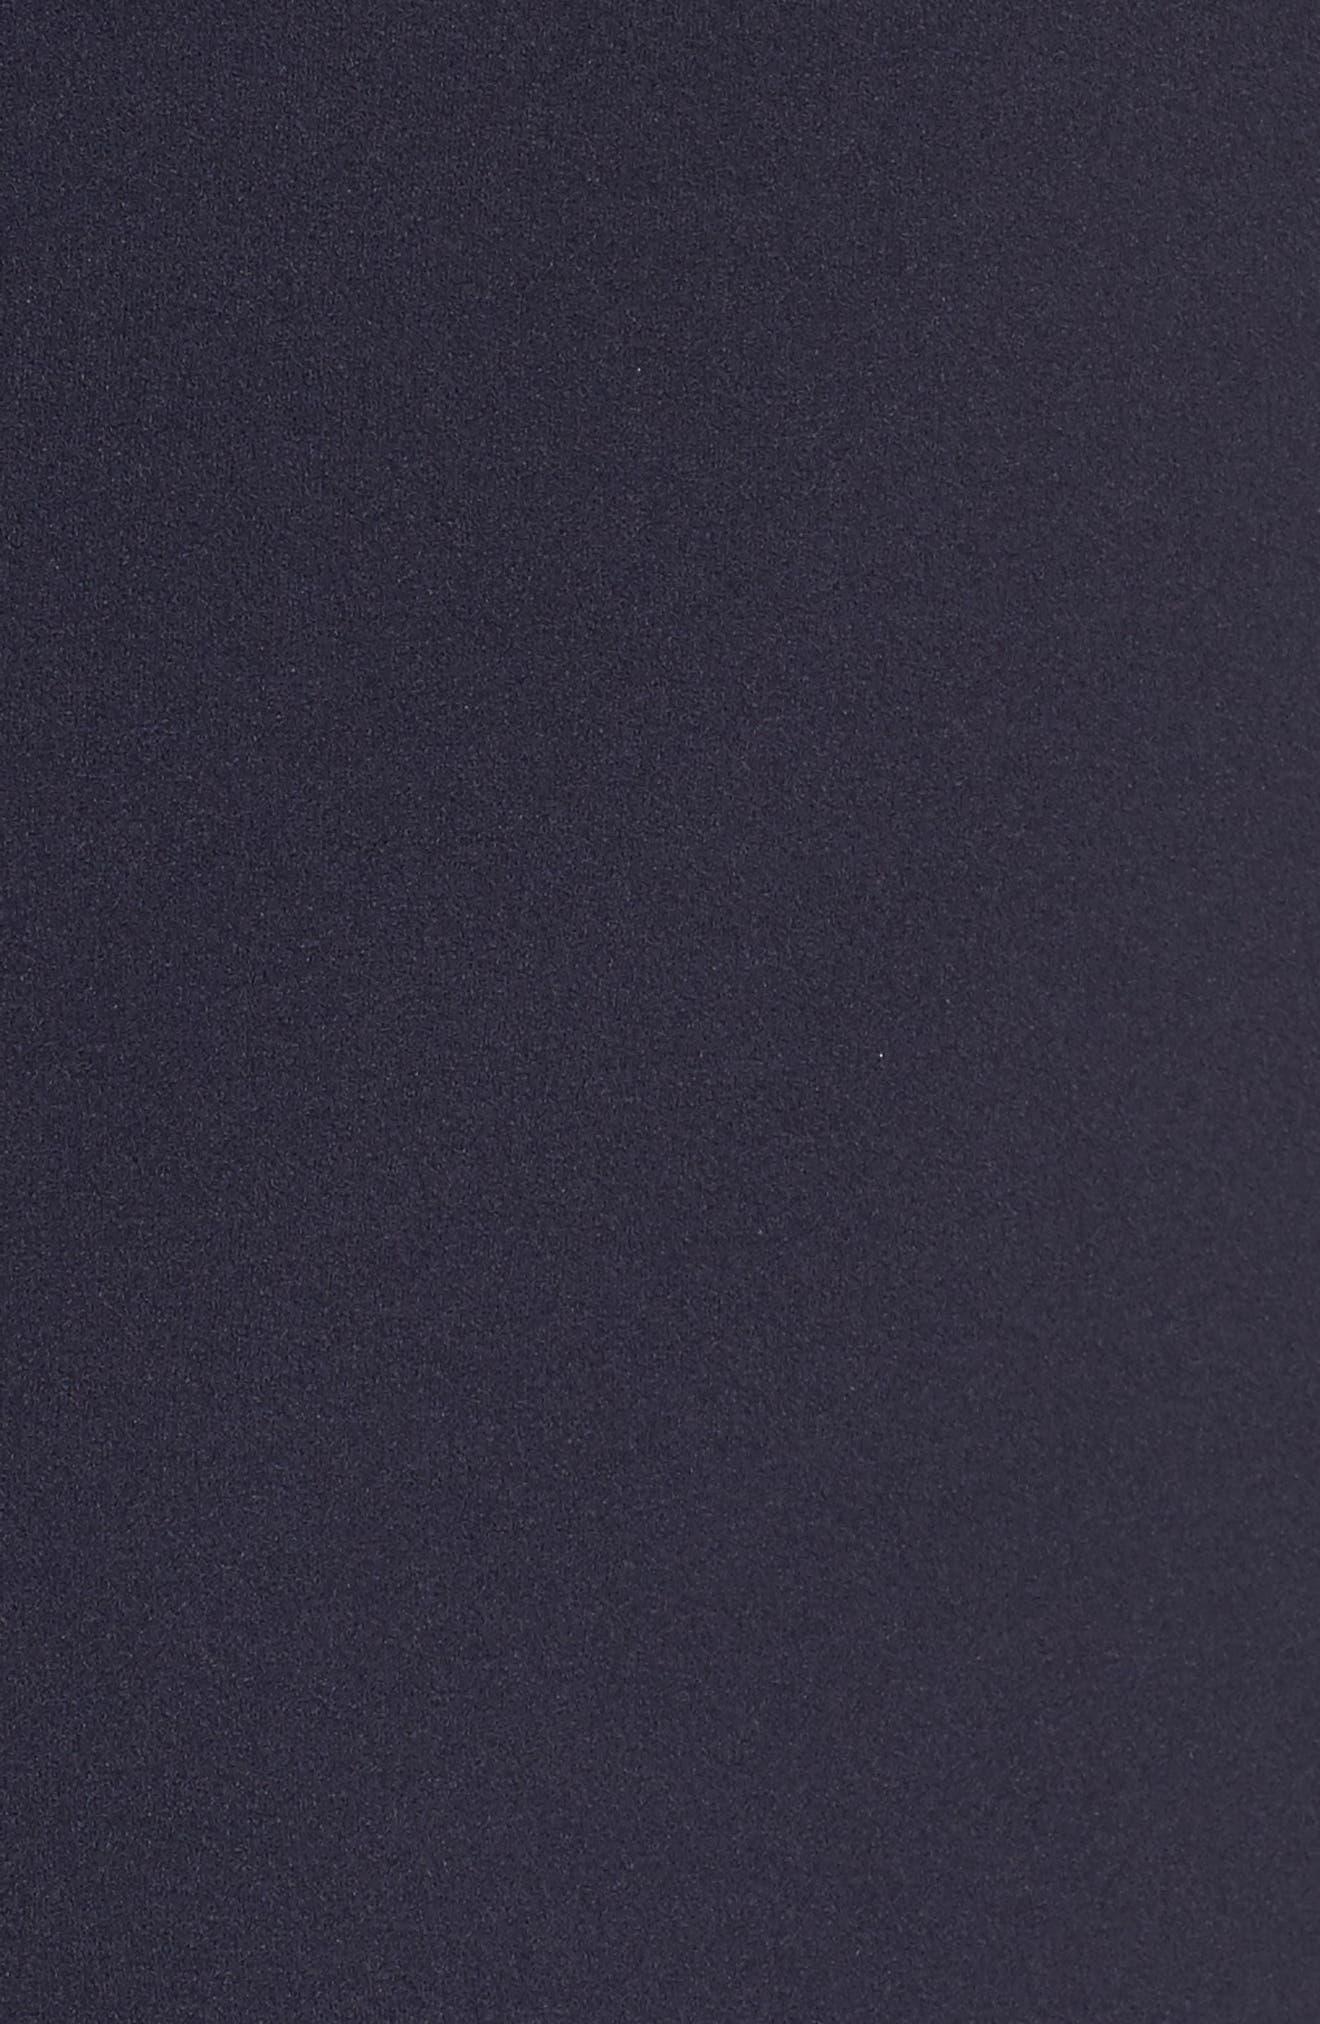 One-Shoulder Sheath Dress,                             Alternate thumbnail 5, color,                             410